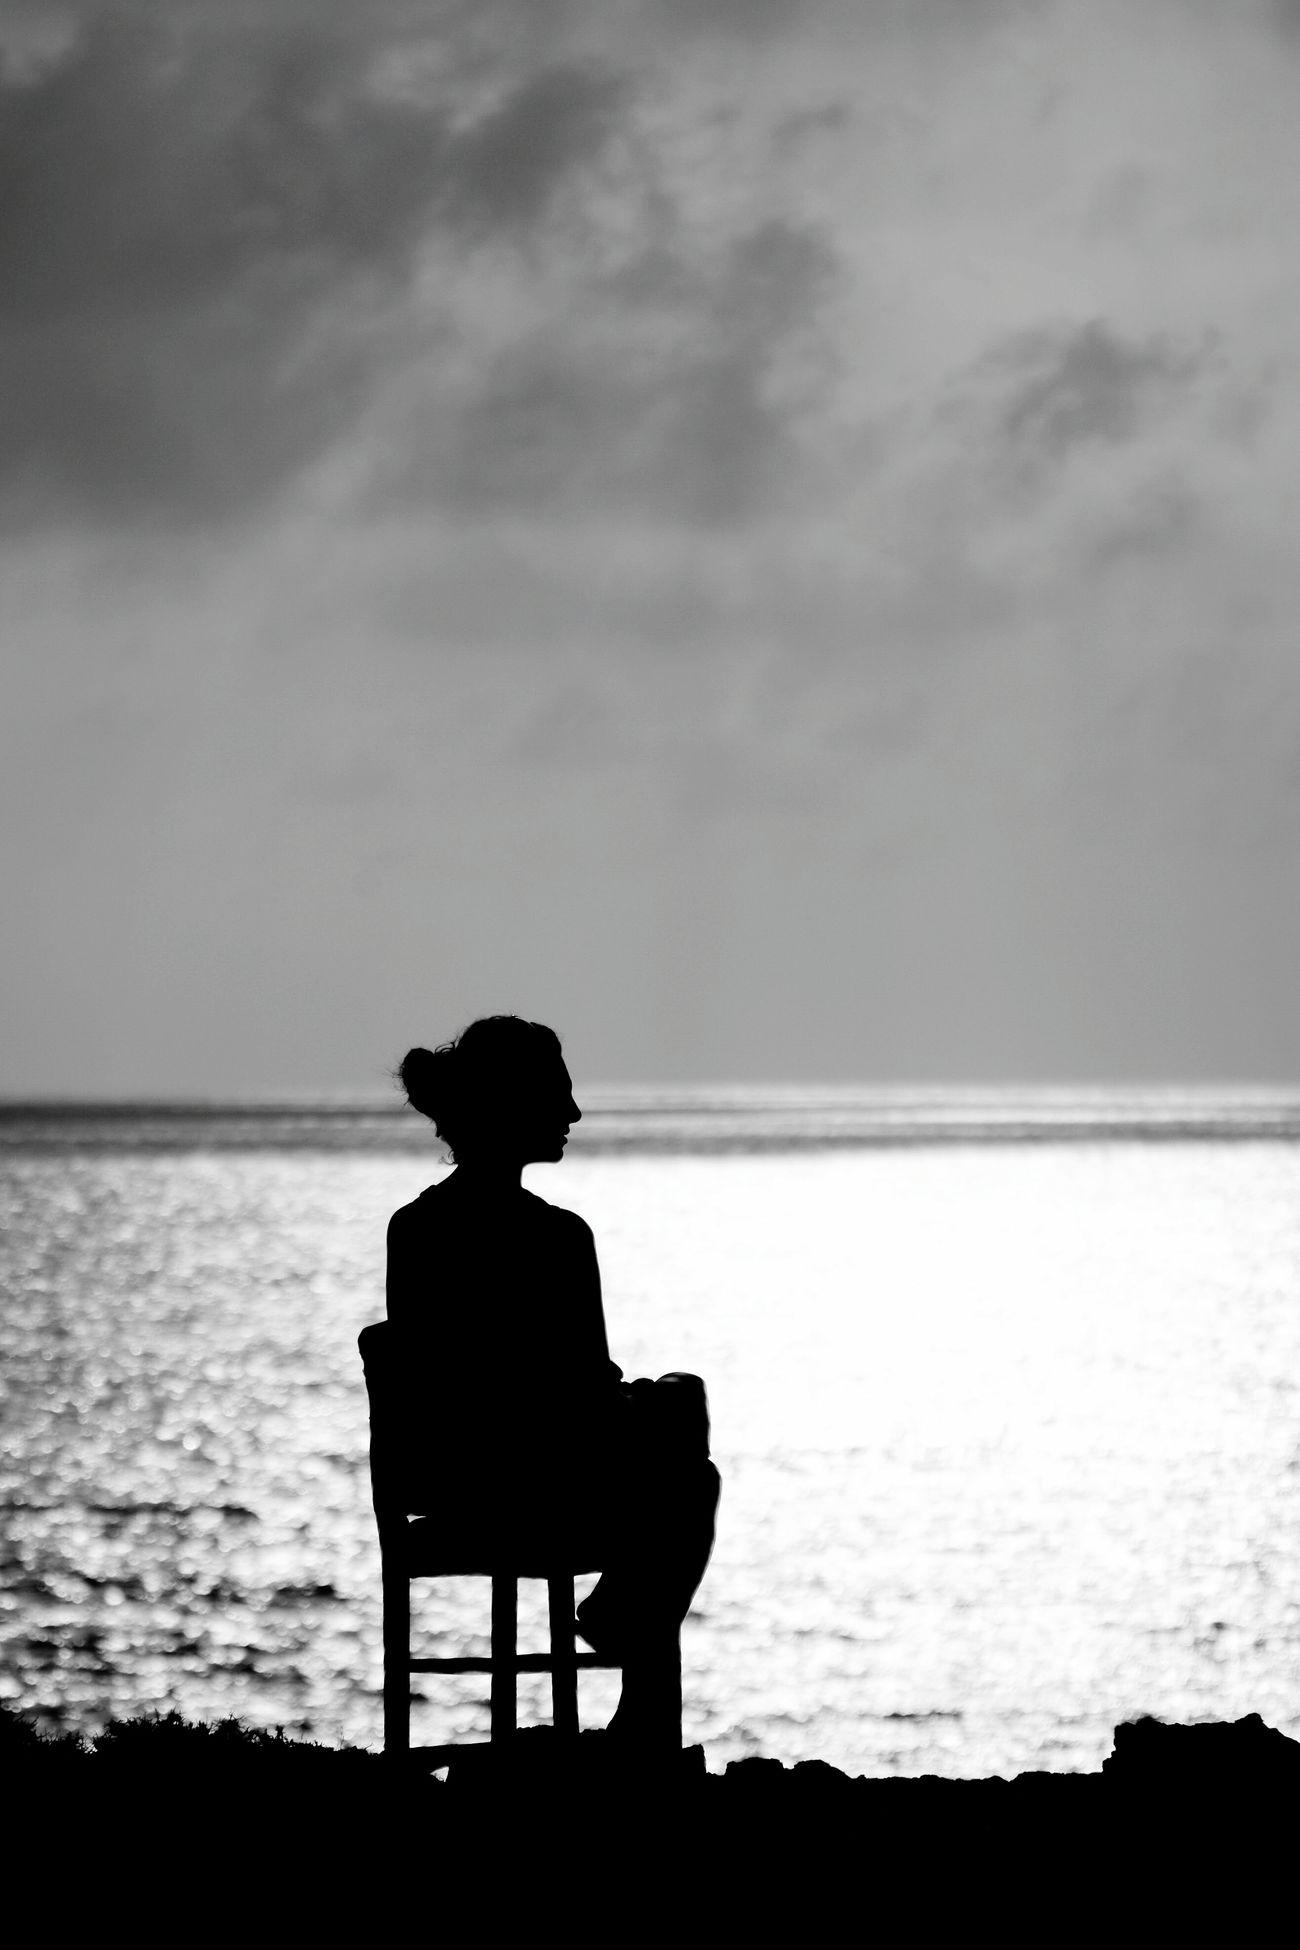 Kibris Cyprus Siluette Sky Black & White